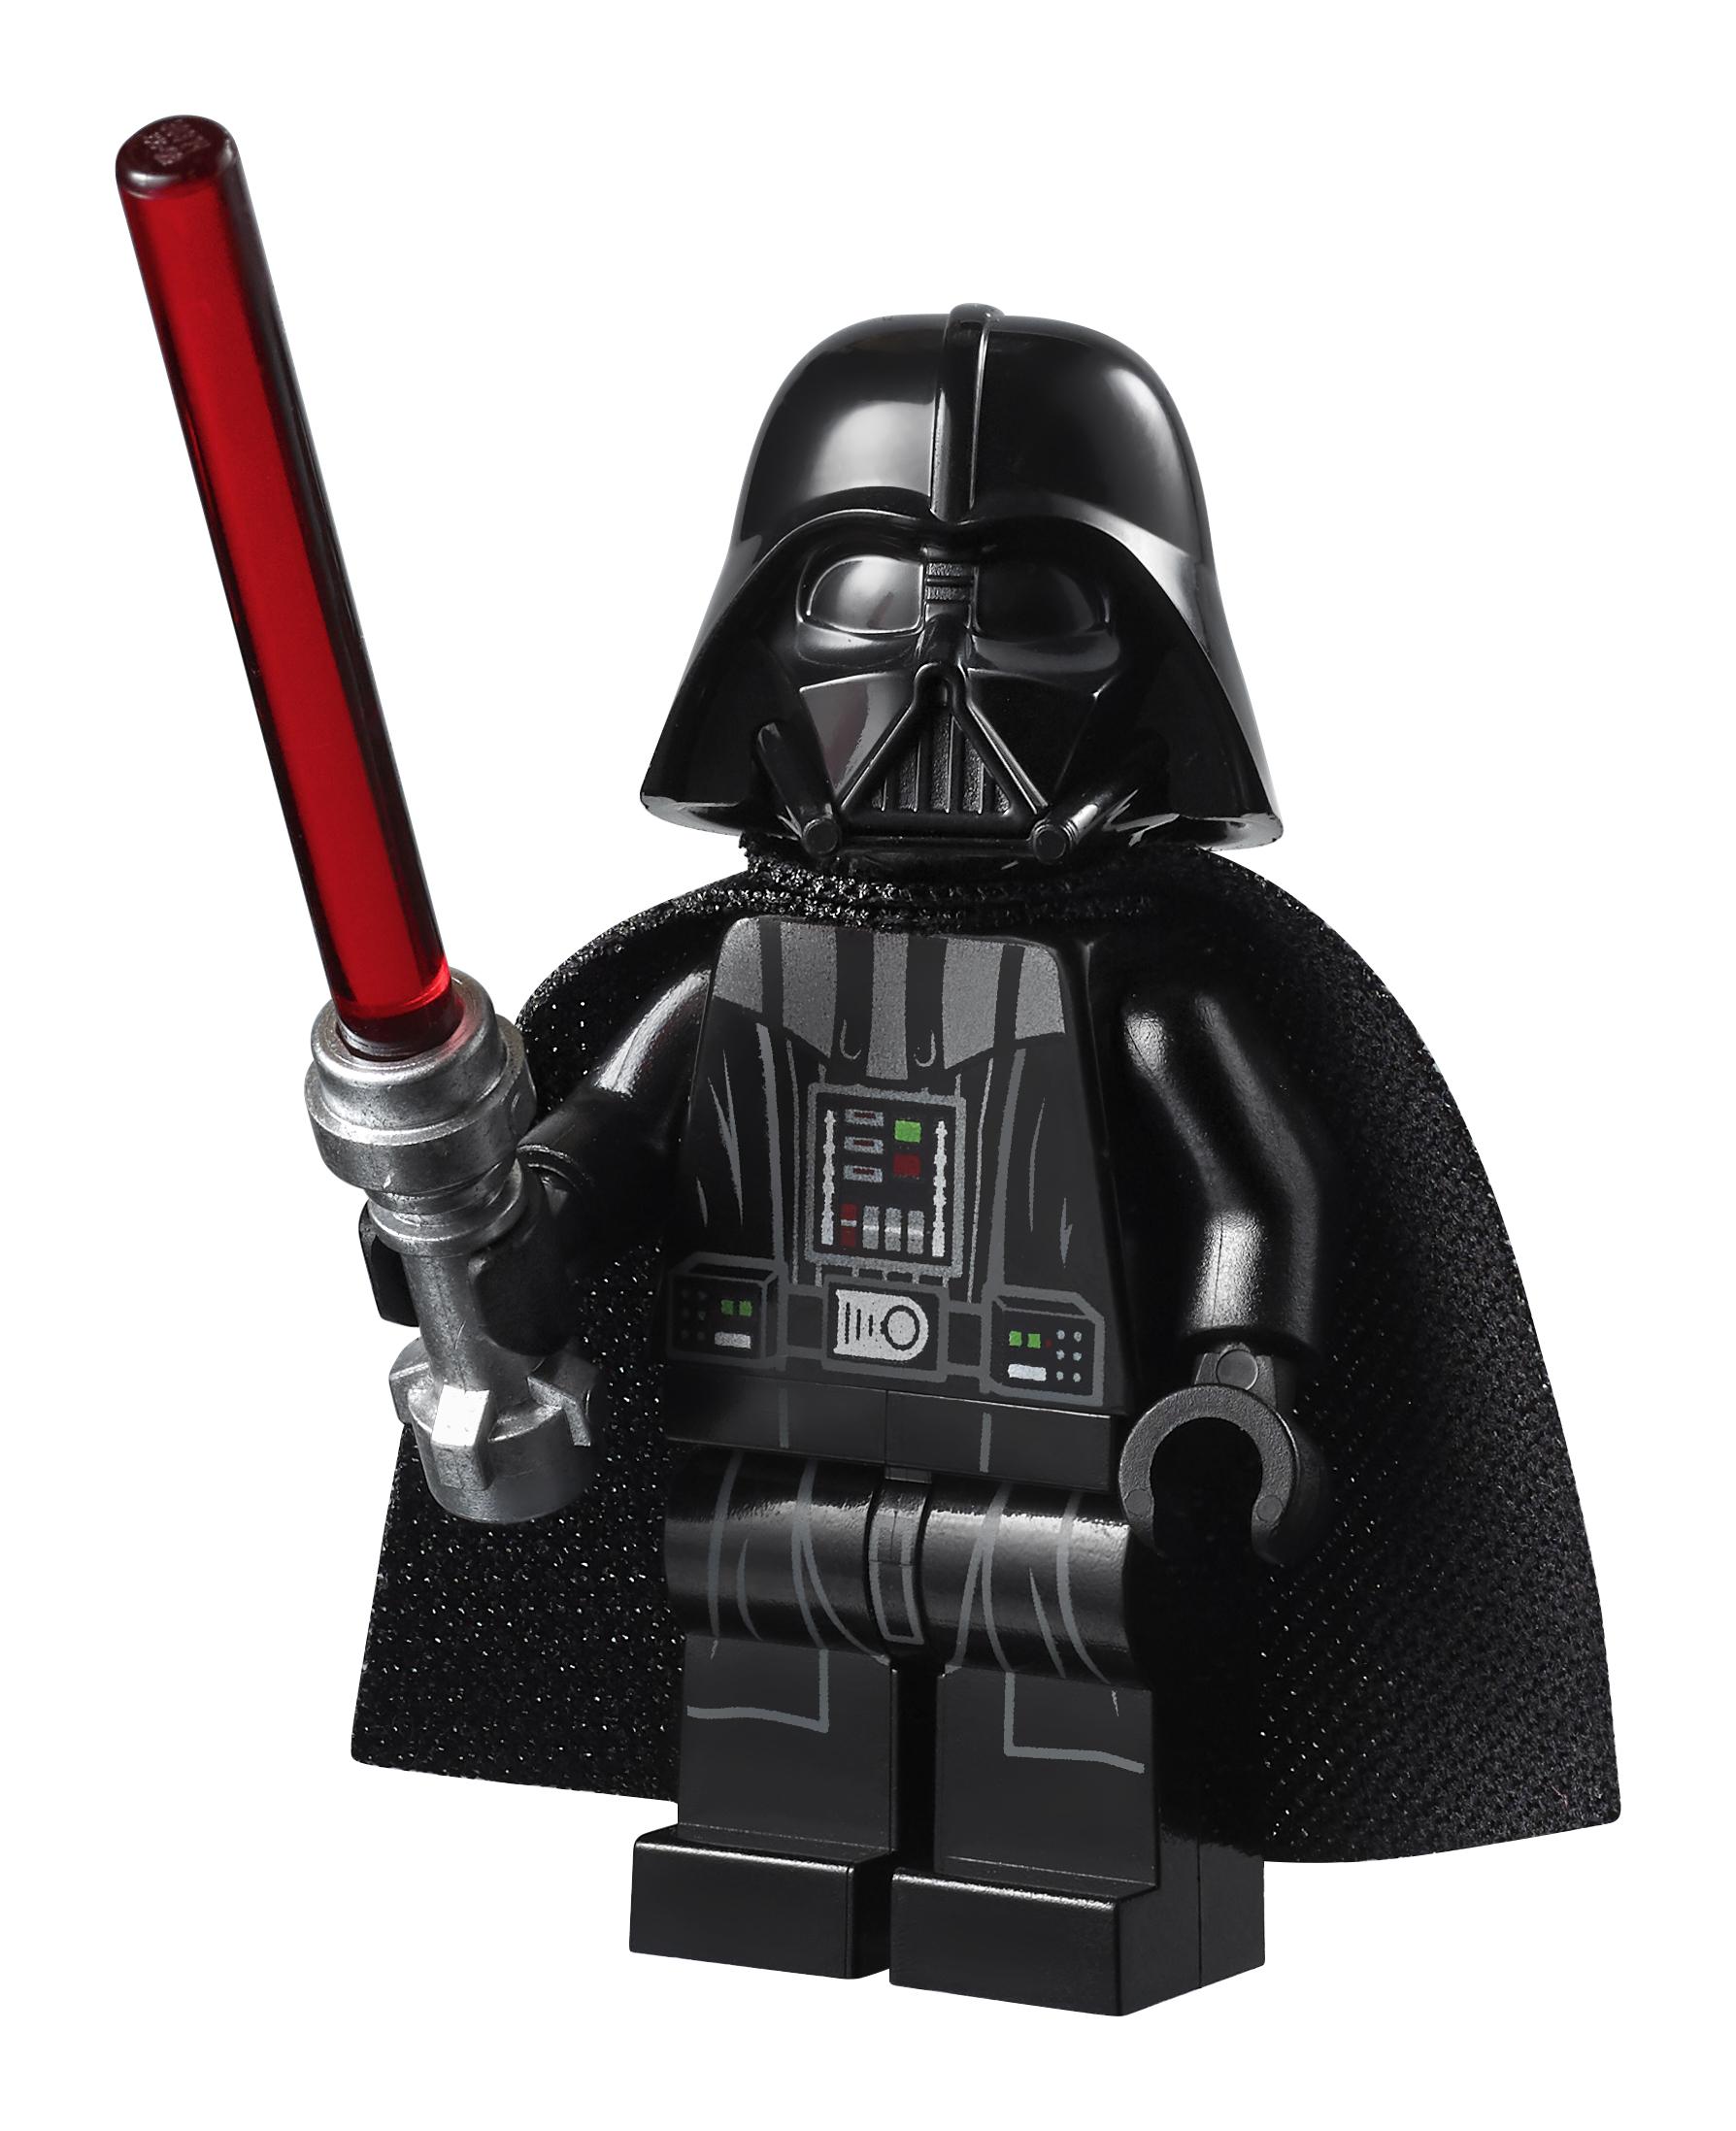 Lego Ugnaught 75222 Betrayal at Cloud City Star Wars Minifigure